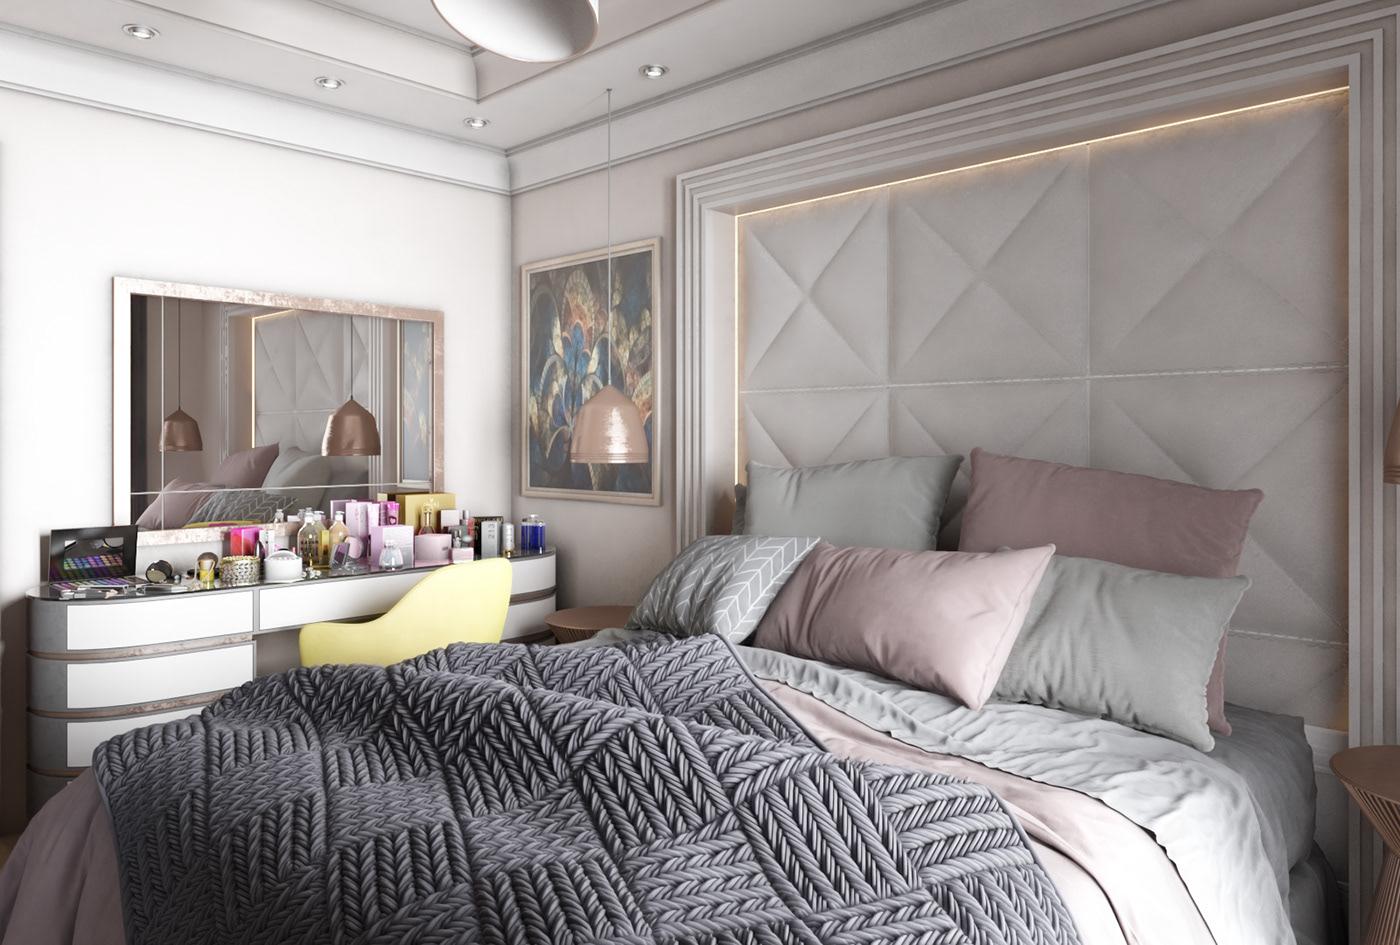 Interior design visualization vray photoshop architecture 3dsmax graphics Motaz mostafa